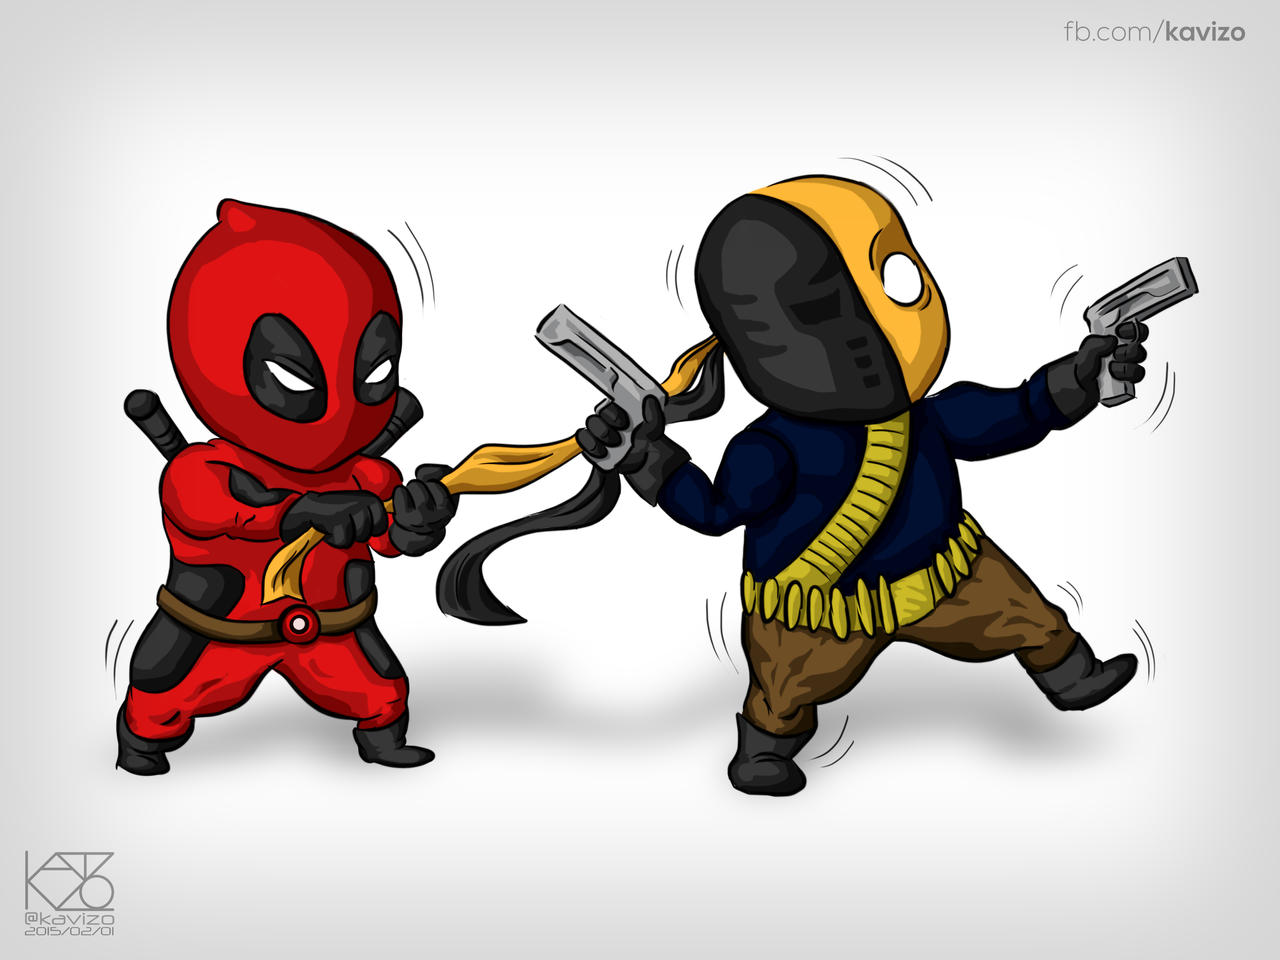 Chibi Deadpool And Deathstroke By Kavizo By KAVIZO On DeviantArt